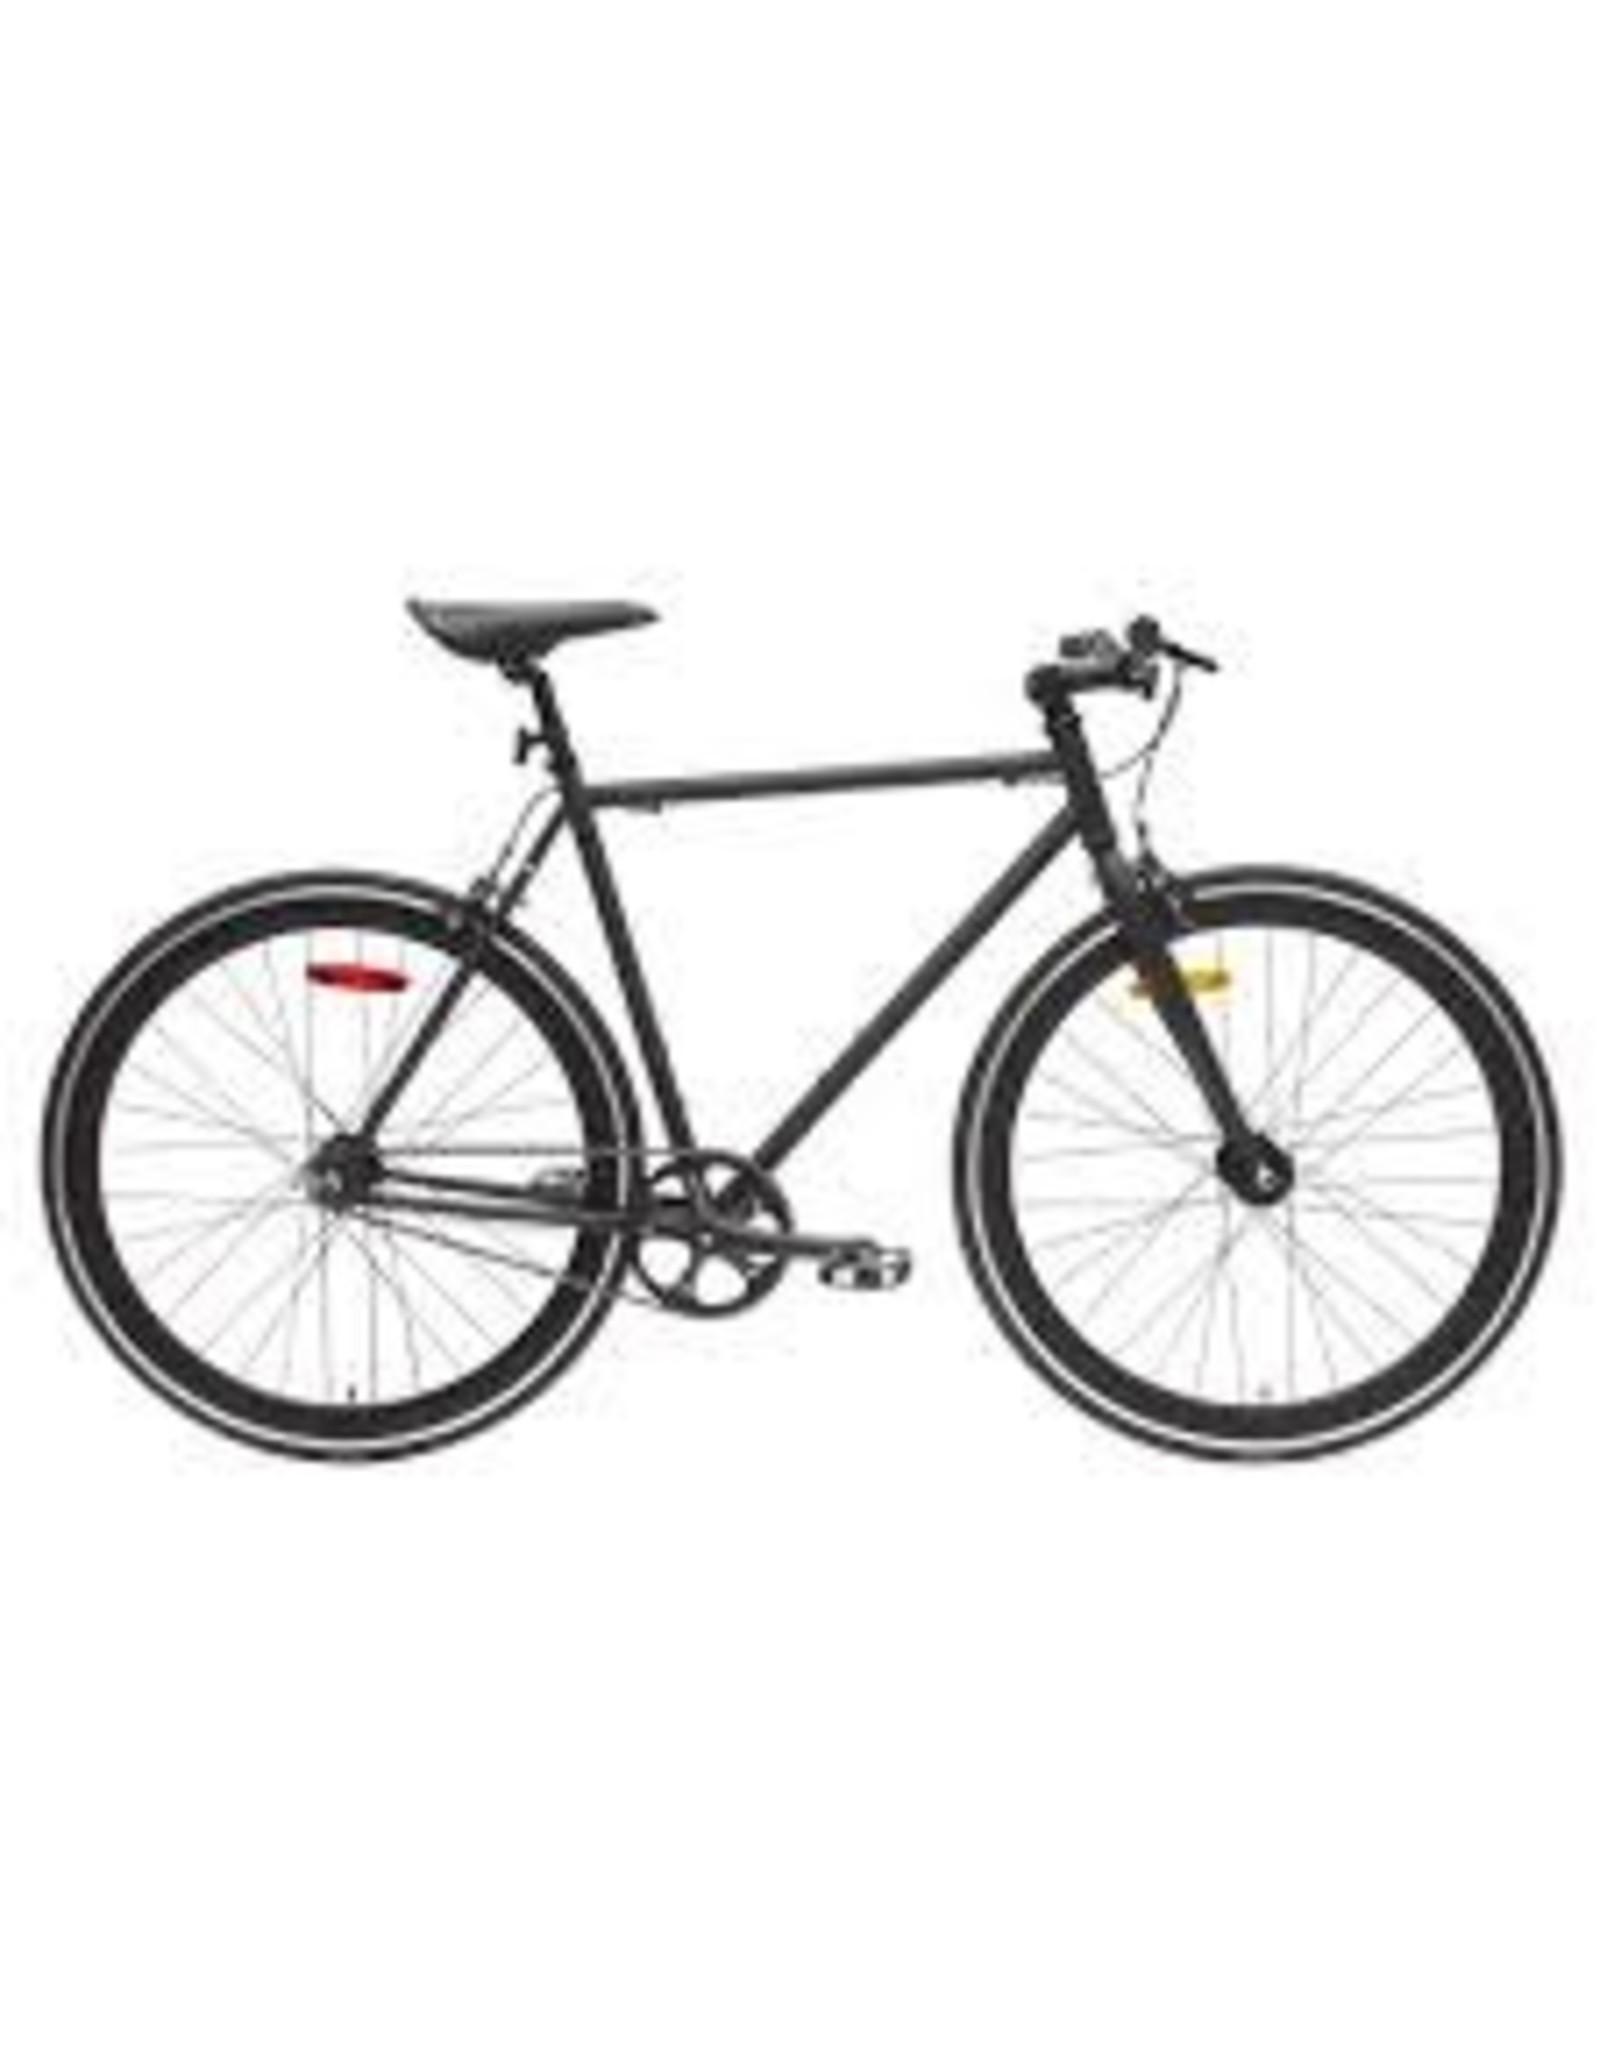 DCO Fixie / Single Speed Bike - DCO 1 speed bike